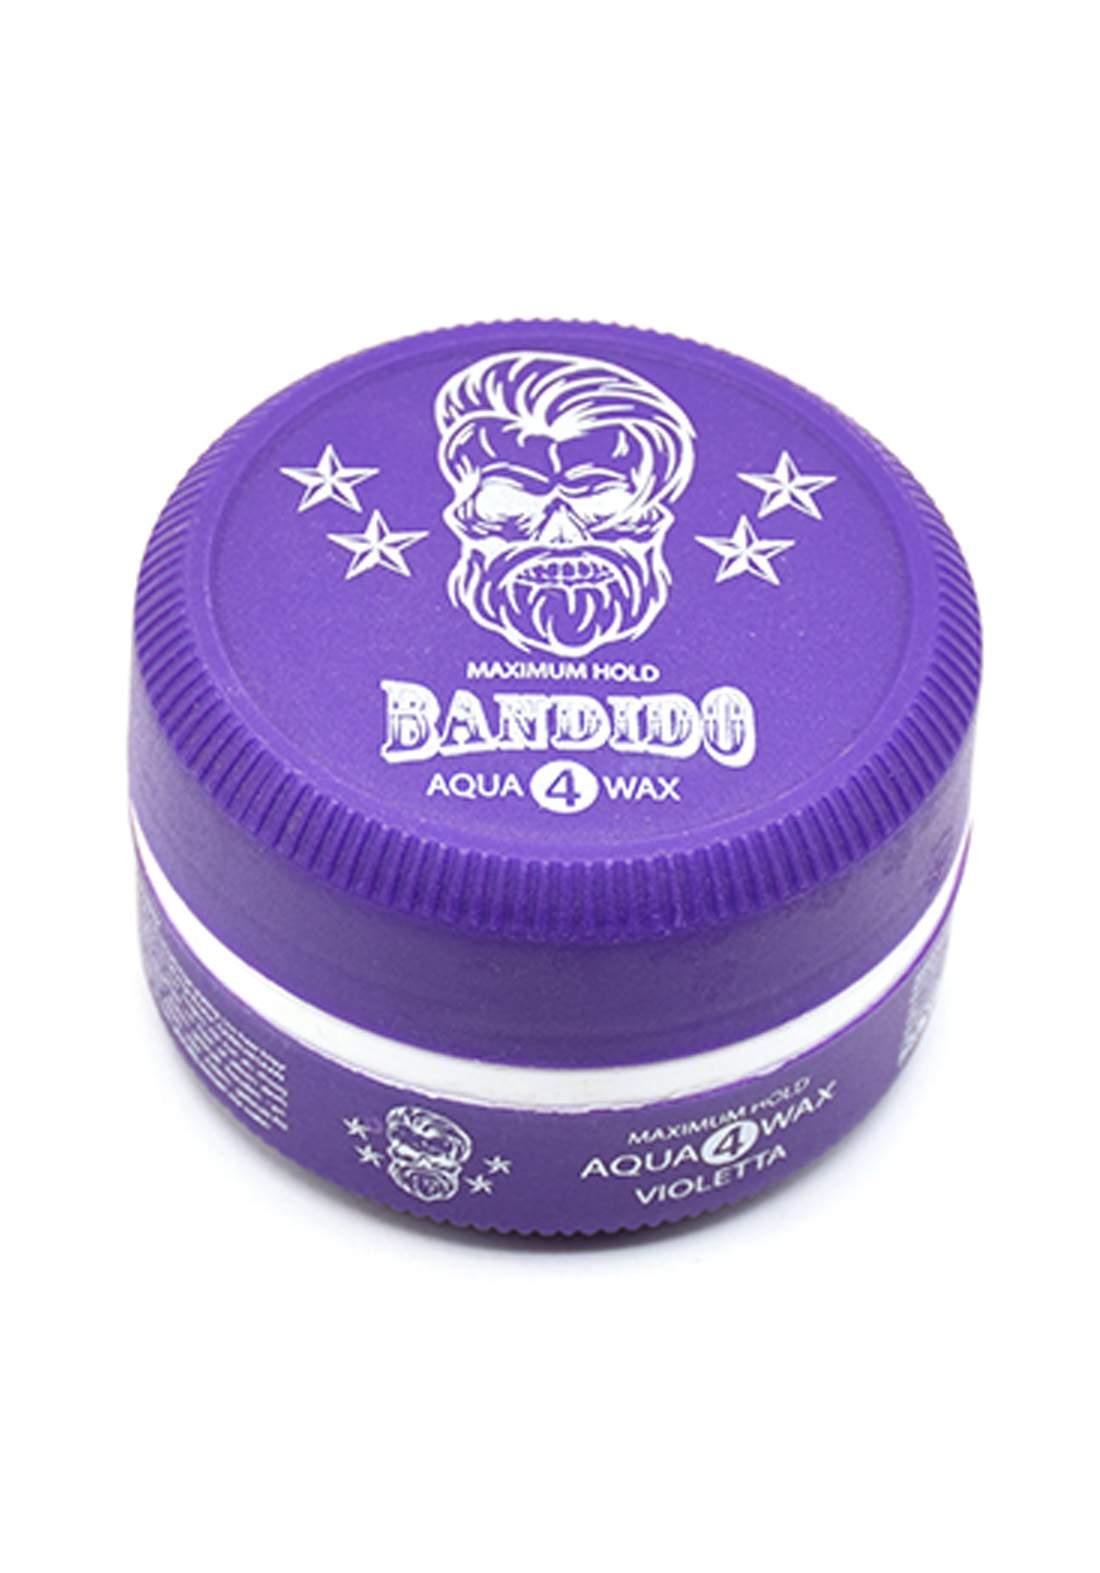 Bandido Aqua 4 Wax  Maximum Hold-150ml جل تصفيف الشعر